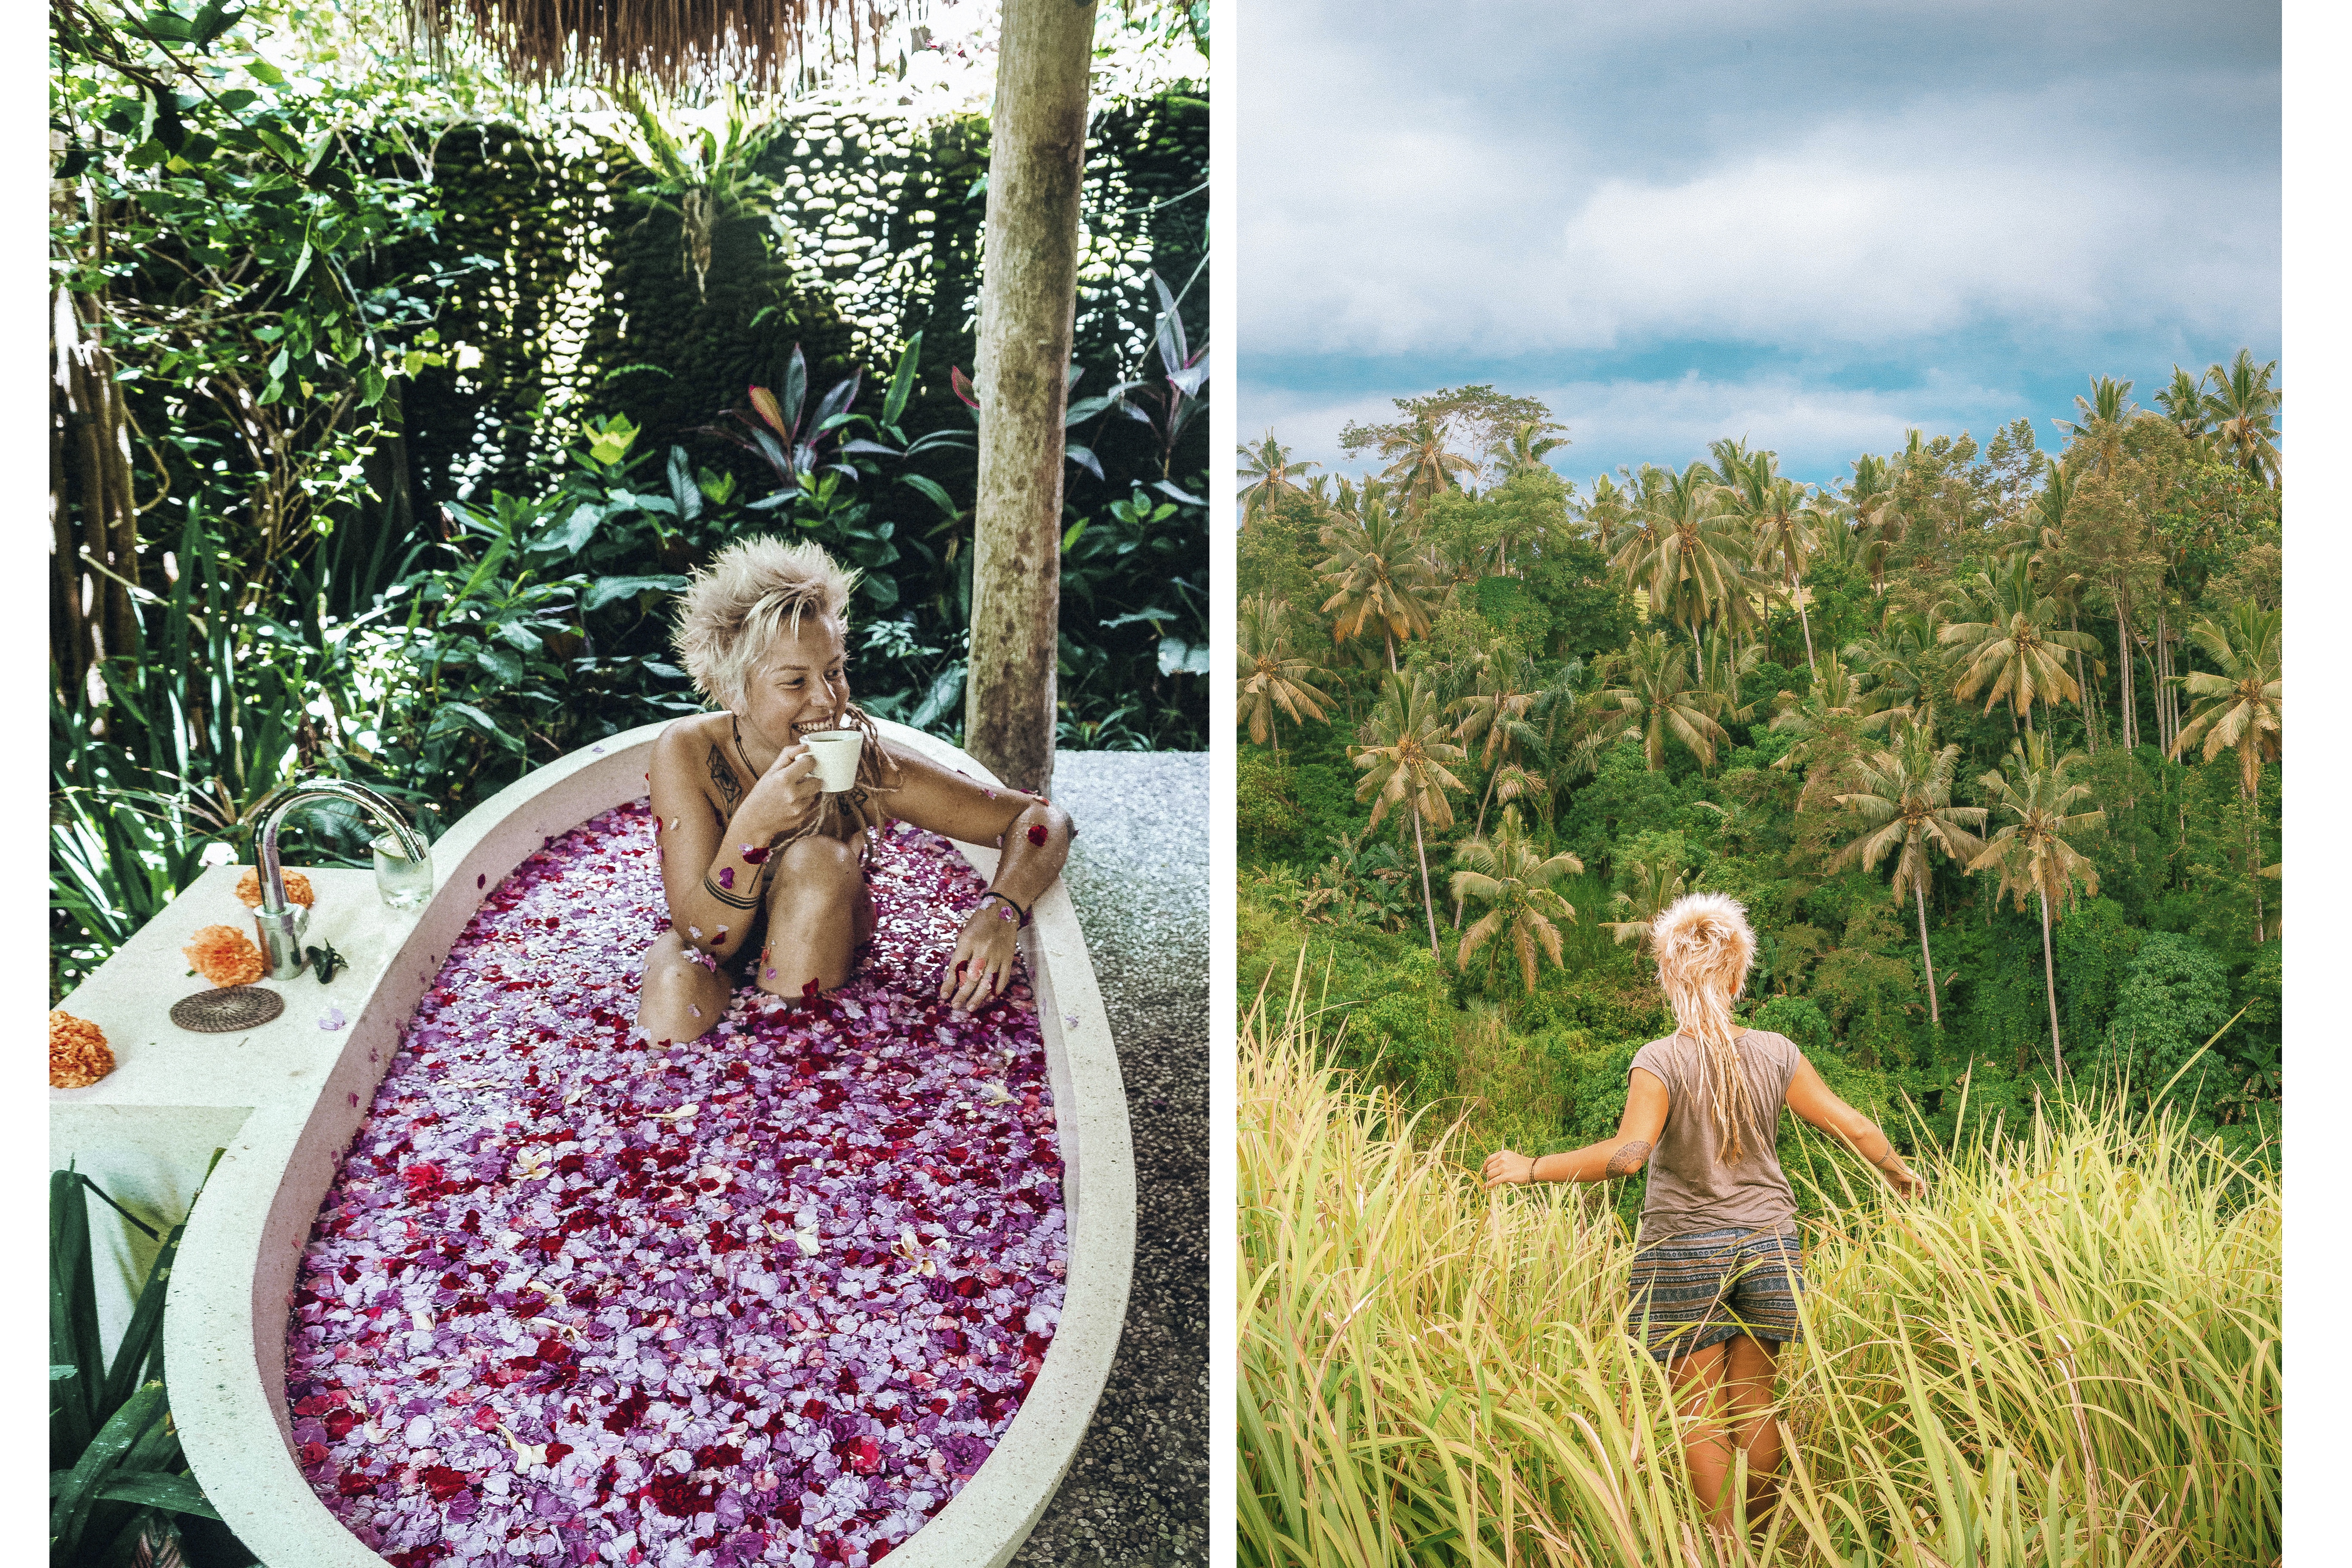 beautiful spa karsa spa bali ubud all day treatments walk jungle greenery island